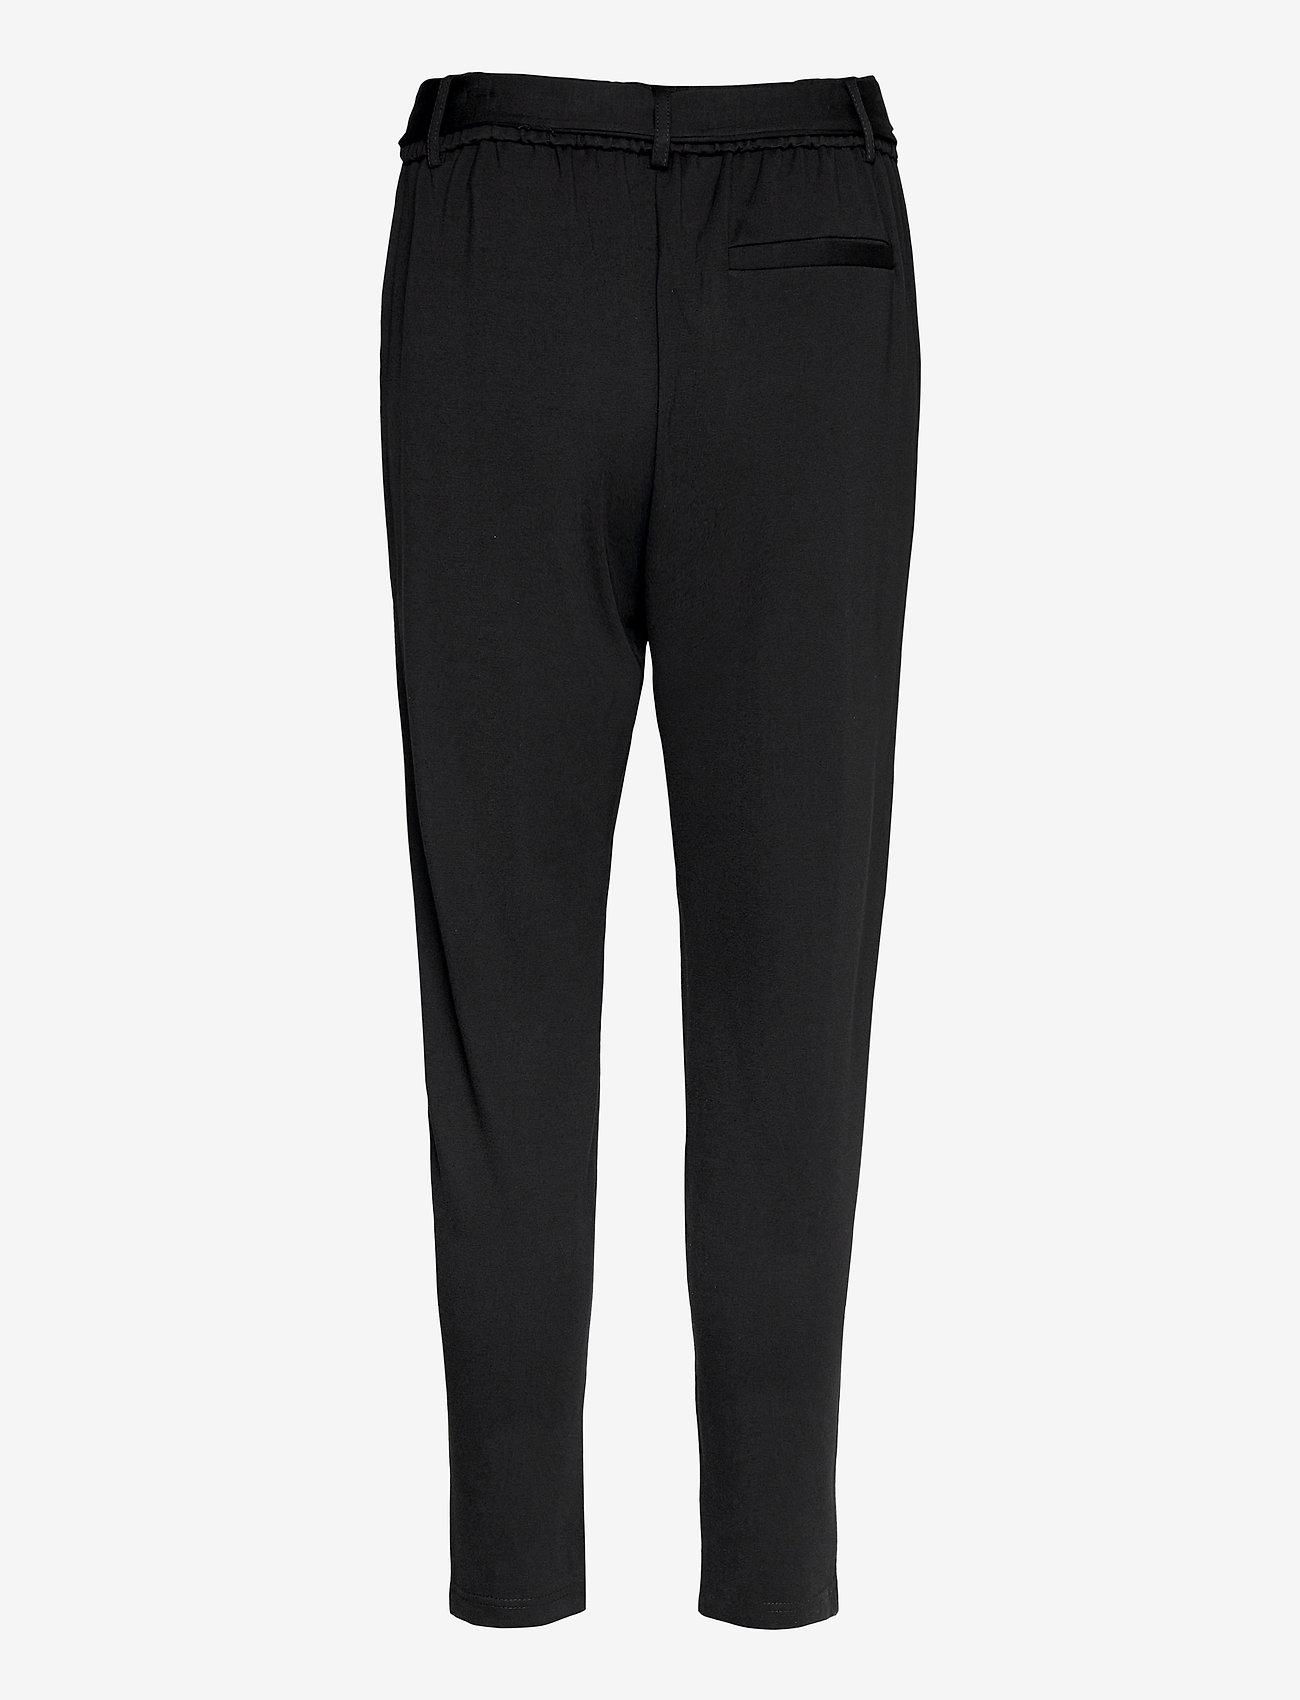 MOSS COPENHAGEN - Popye Pants - slim fit bukser - black - 1